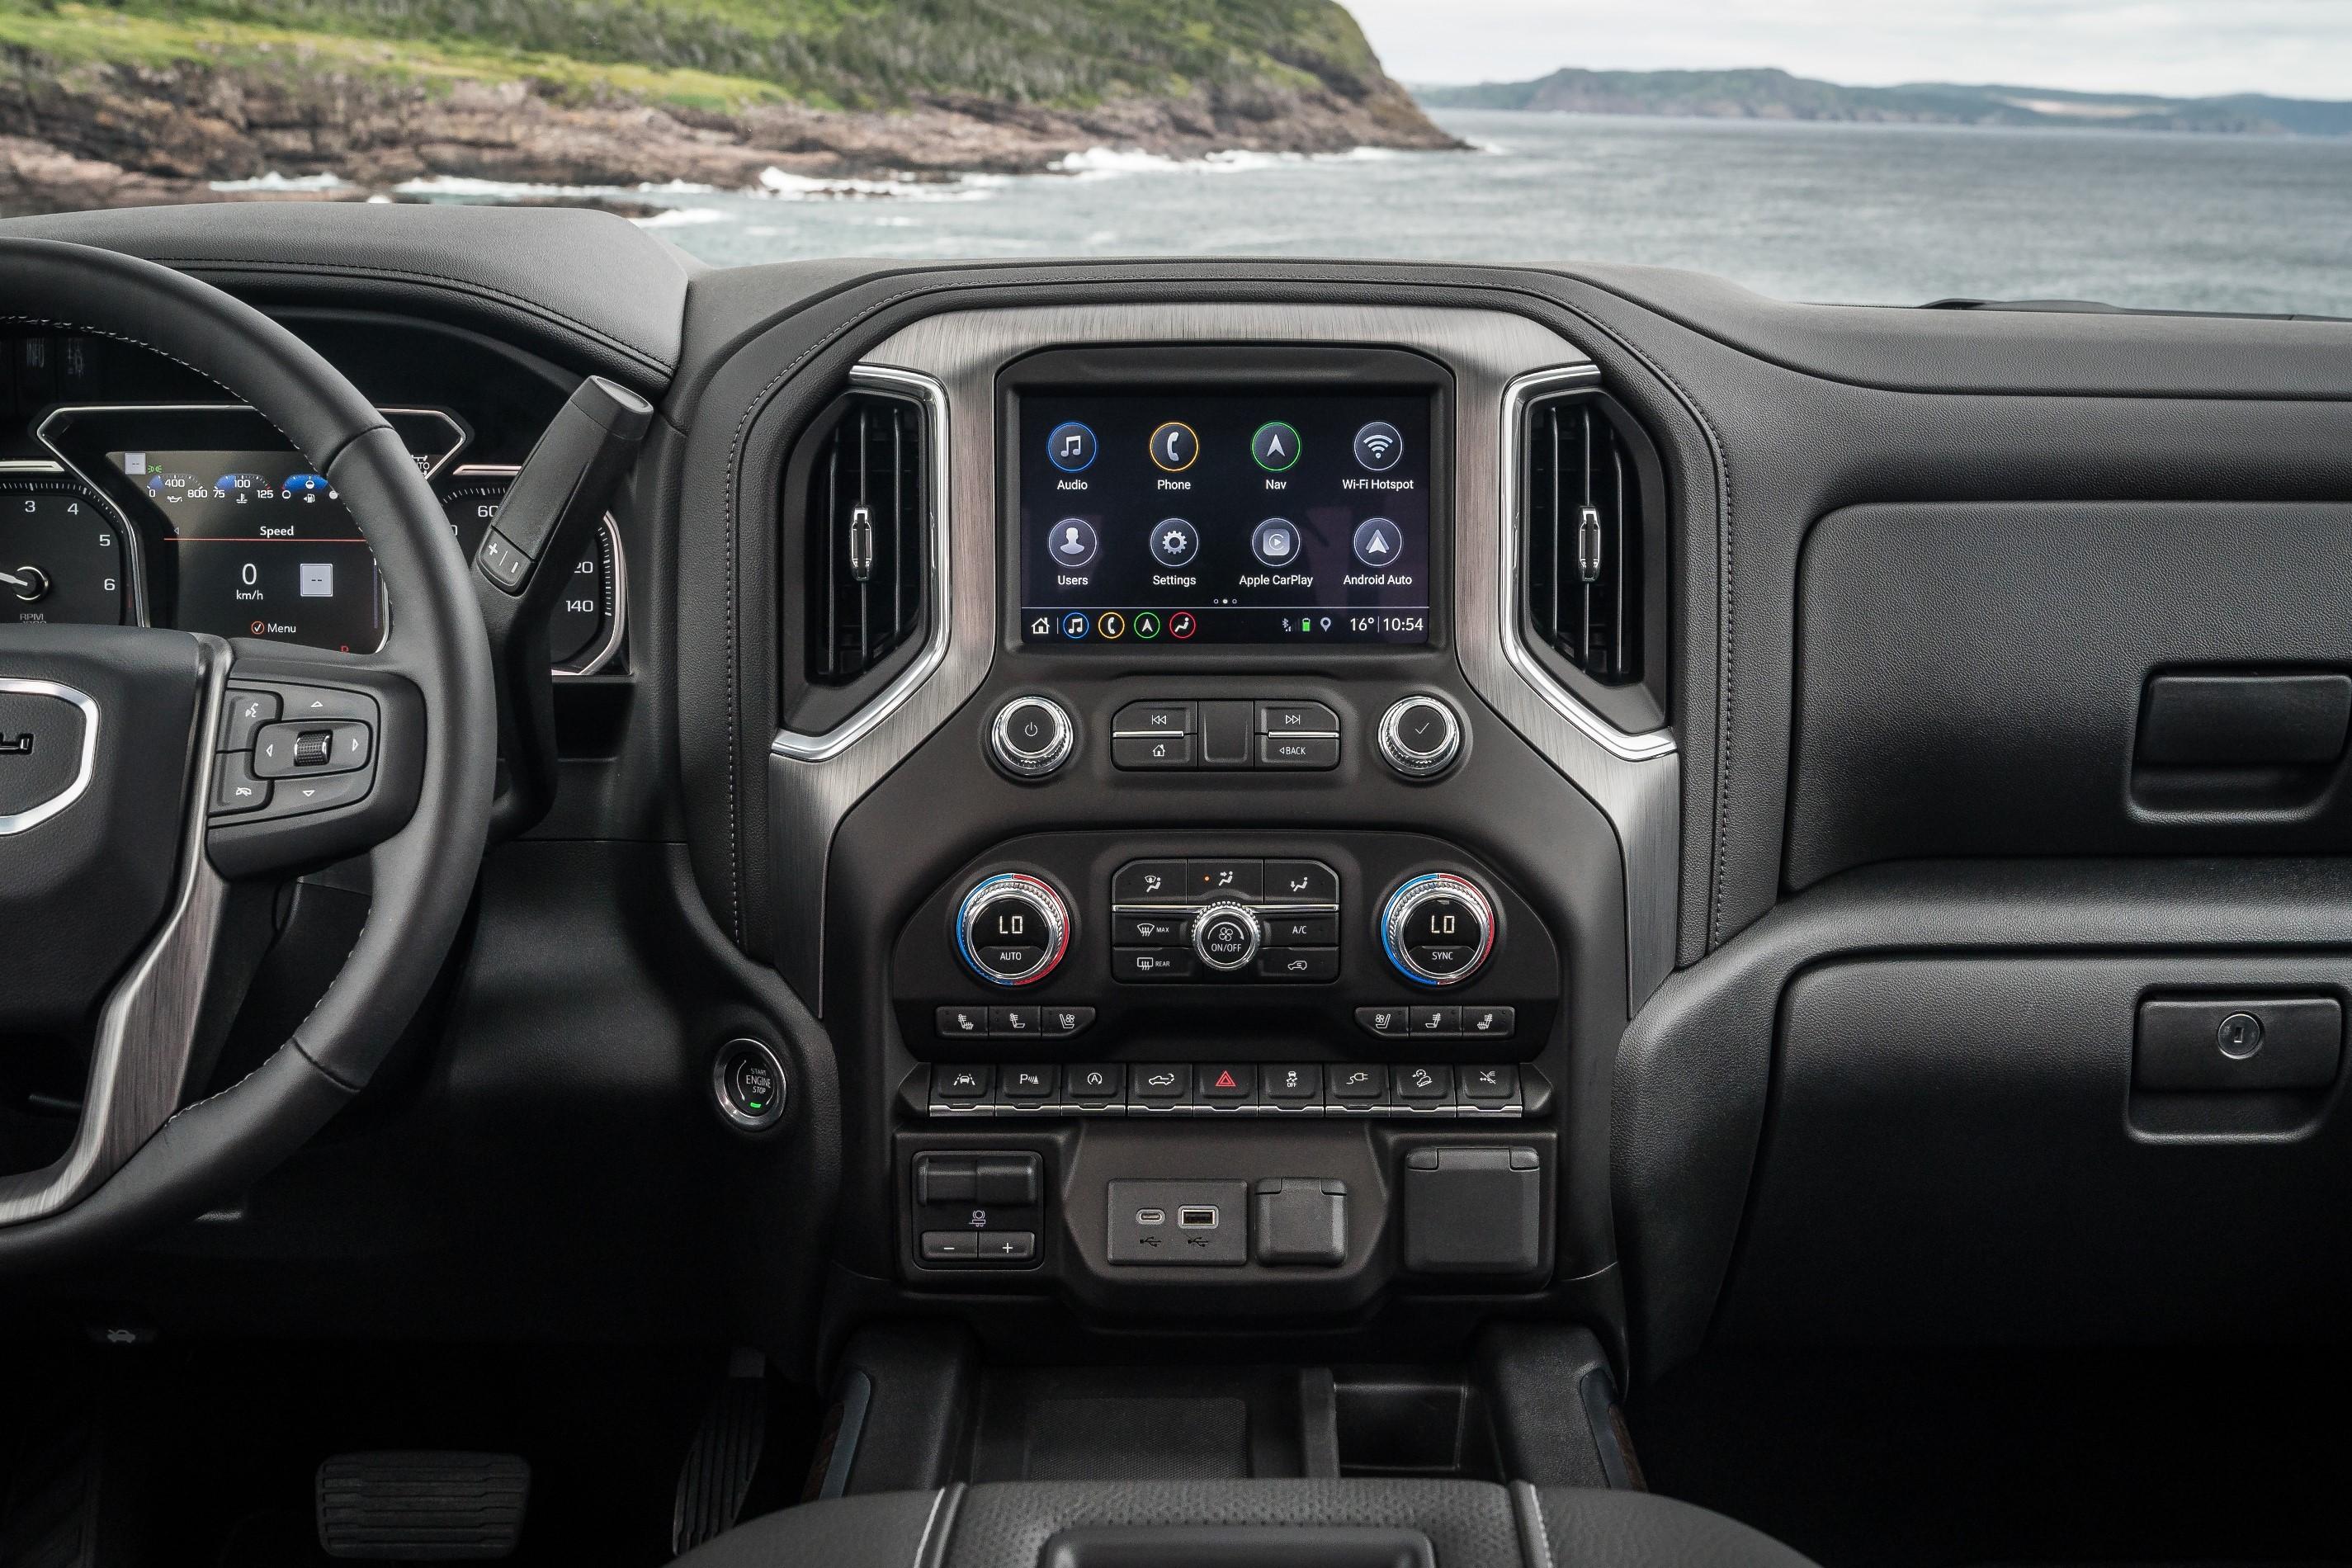 Gmc 1500 Denali >> 2019 GMC Sierra 1500 Denali Now Arriving at Dealers - autoevolution